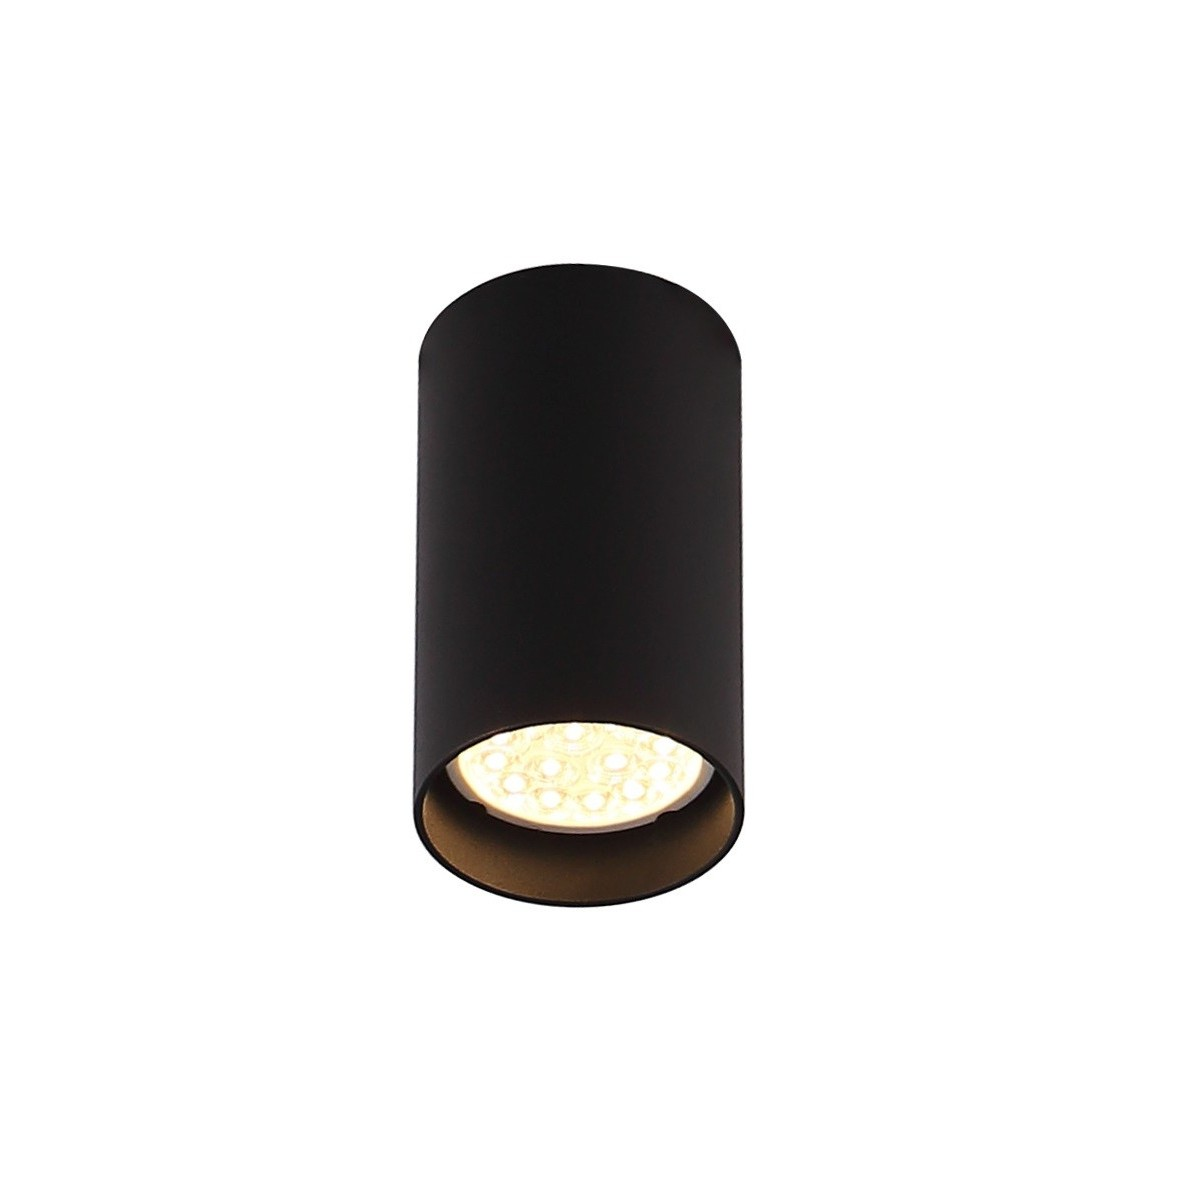 MAXlight PET ROUND Czarny C0142 Sufitowa